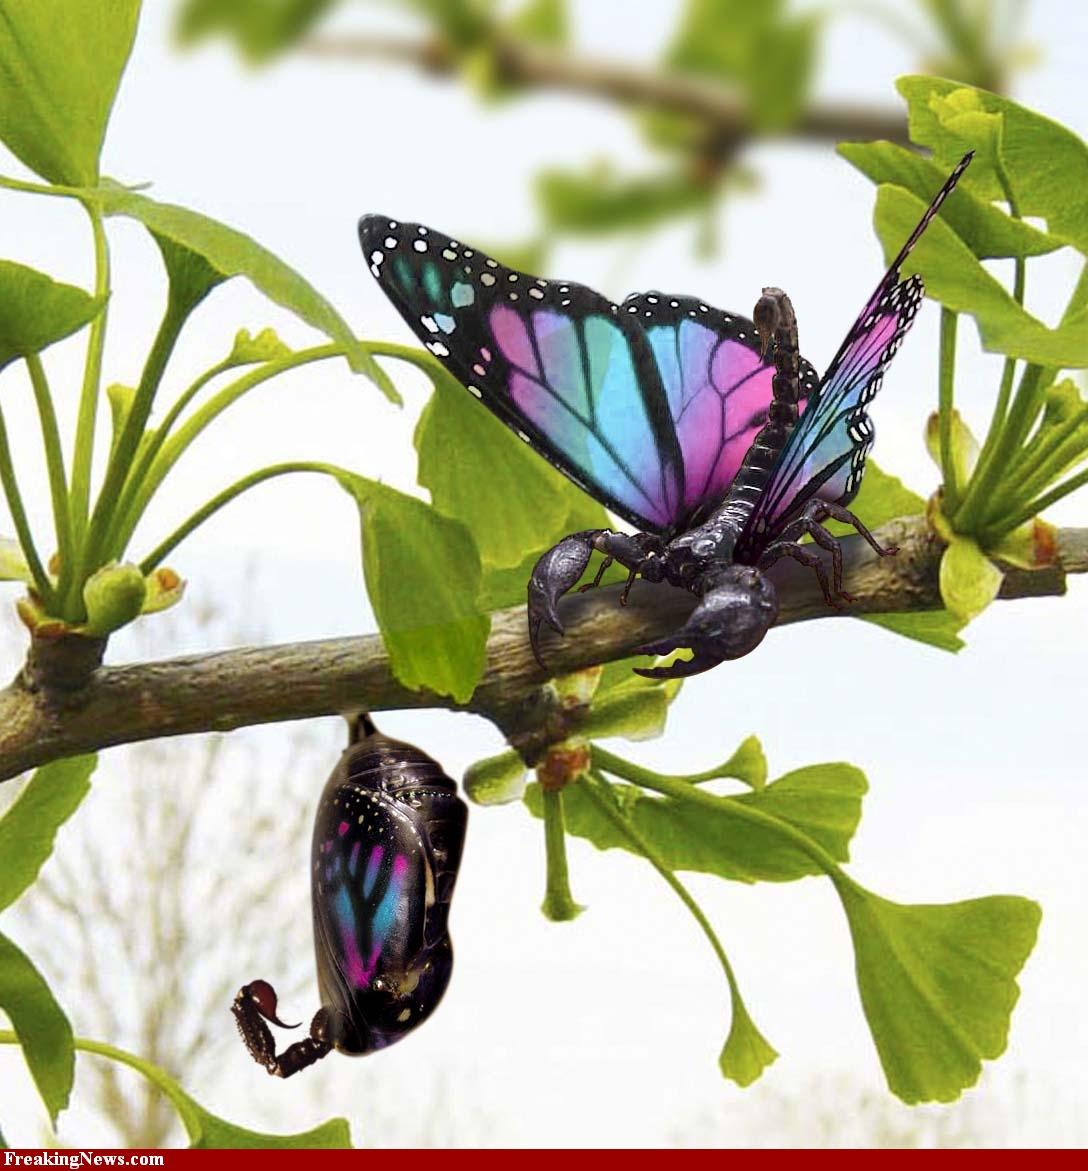 Free Wallpapers: Butterfly Wallpapers, Butterfly